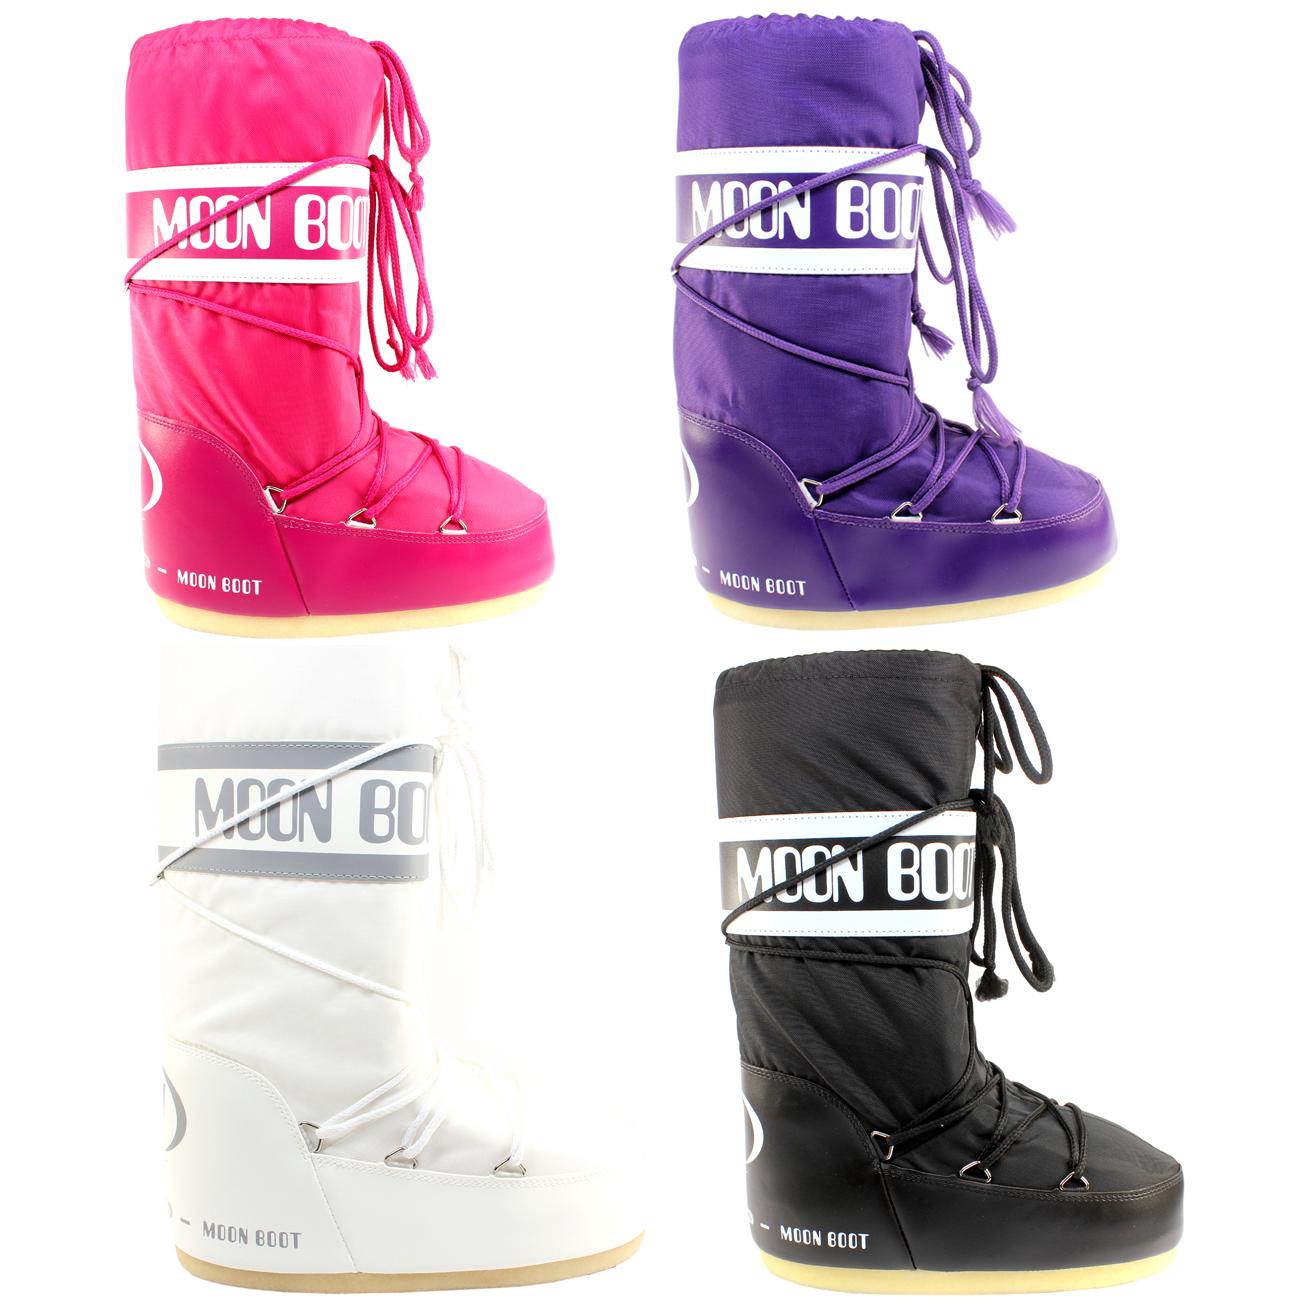 Womens Tecnica Moon Boot Nylon Winter Snow Ski Sking Boots